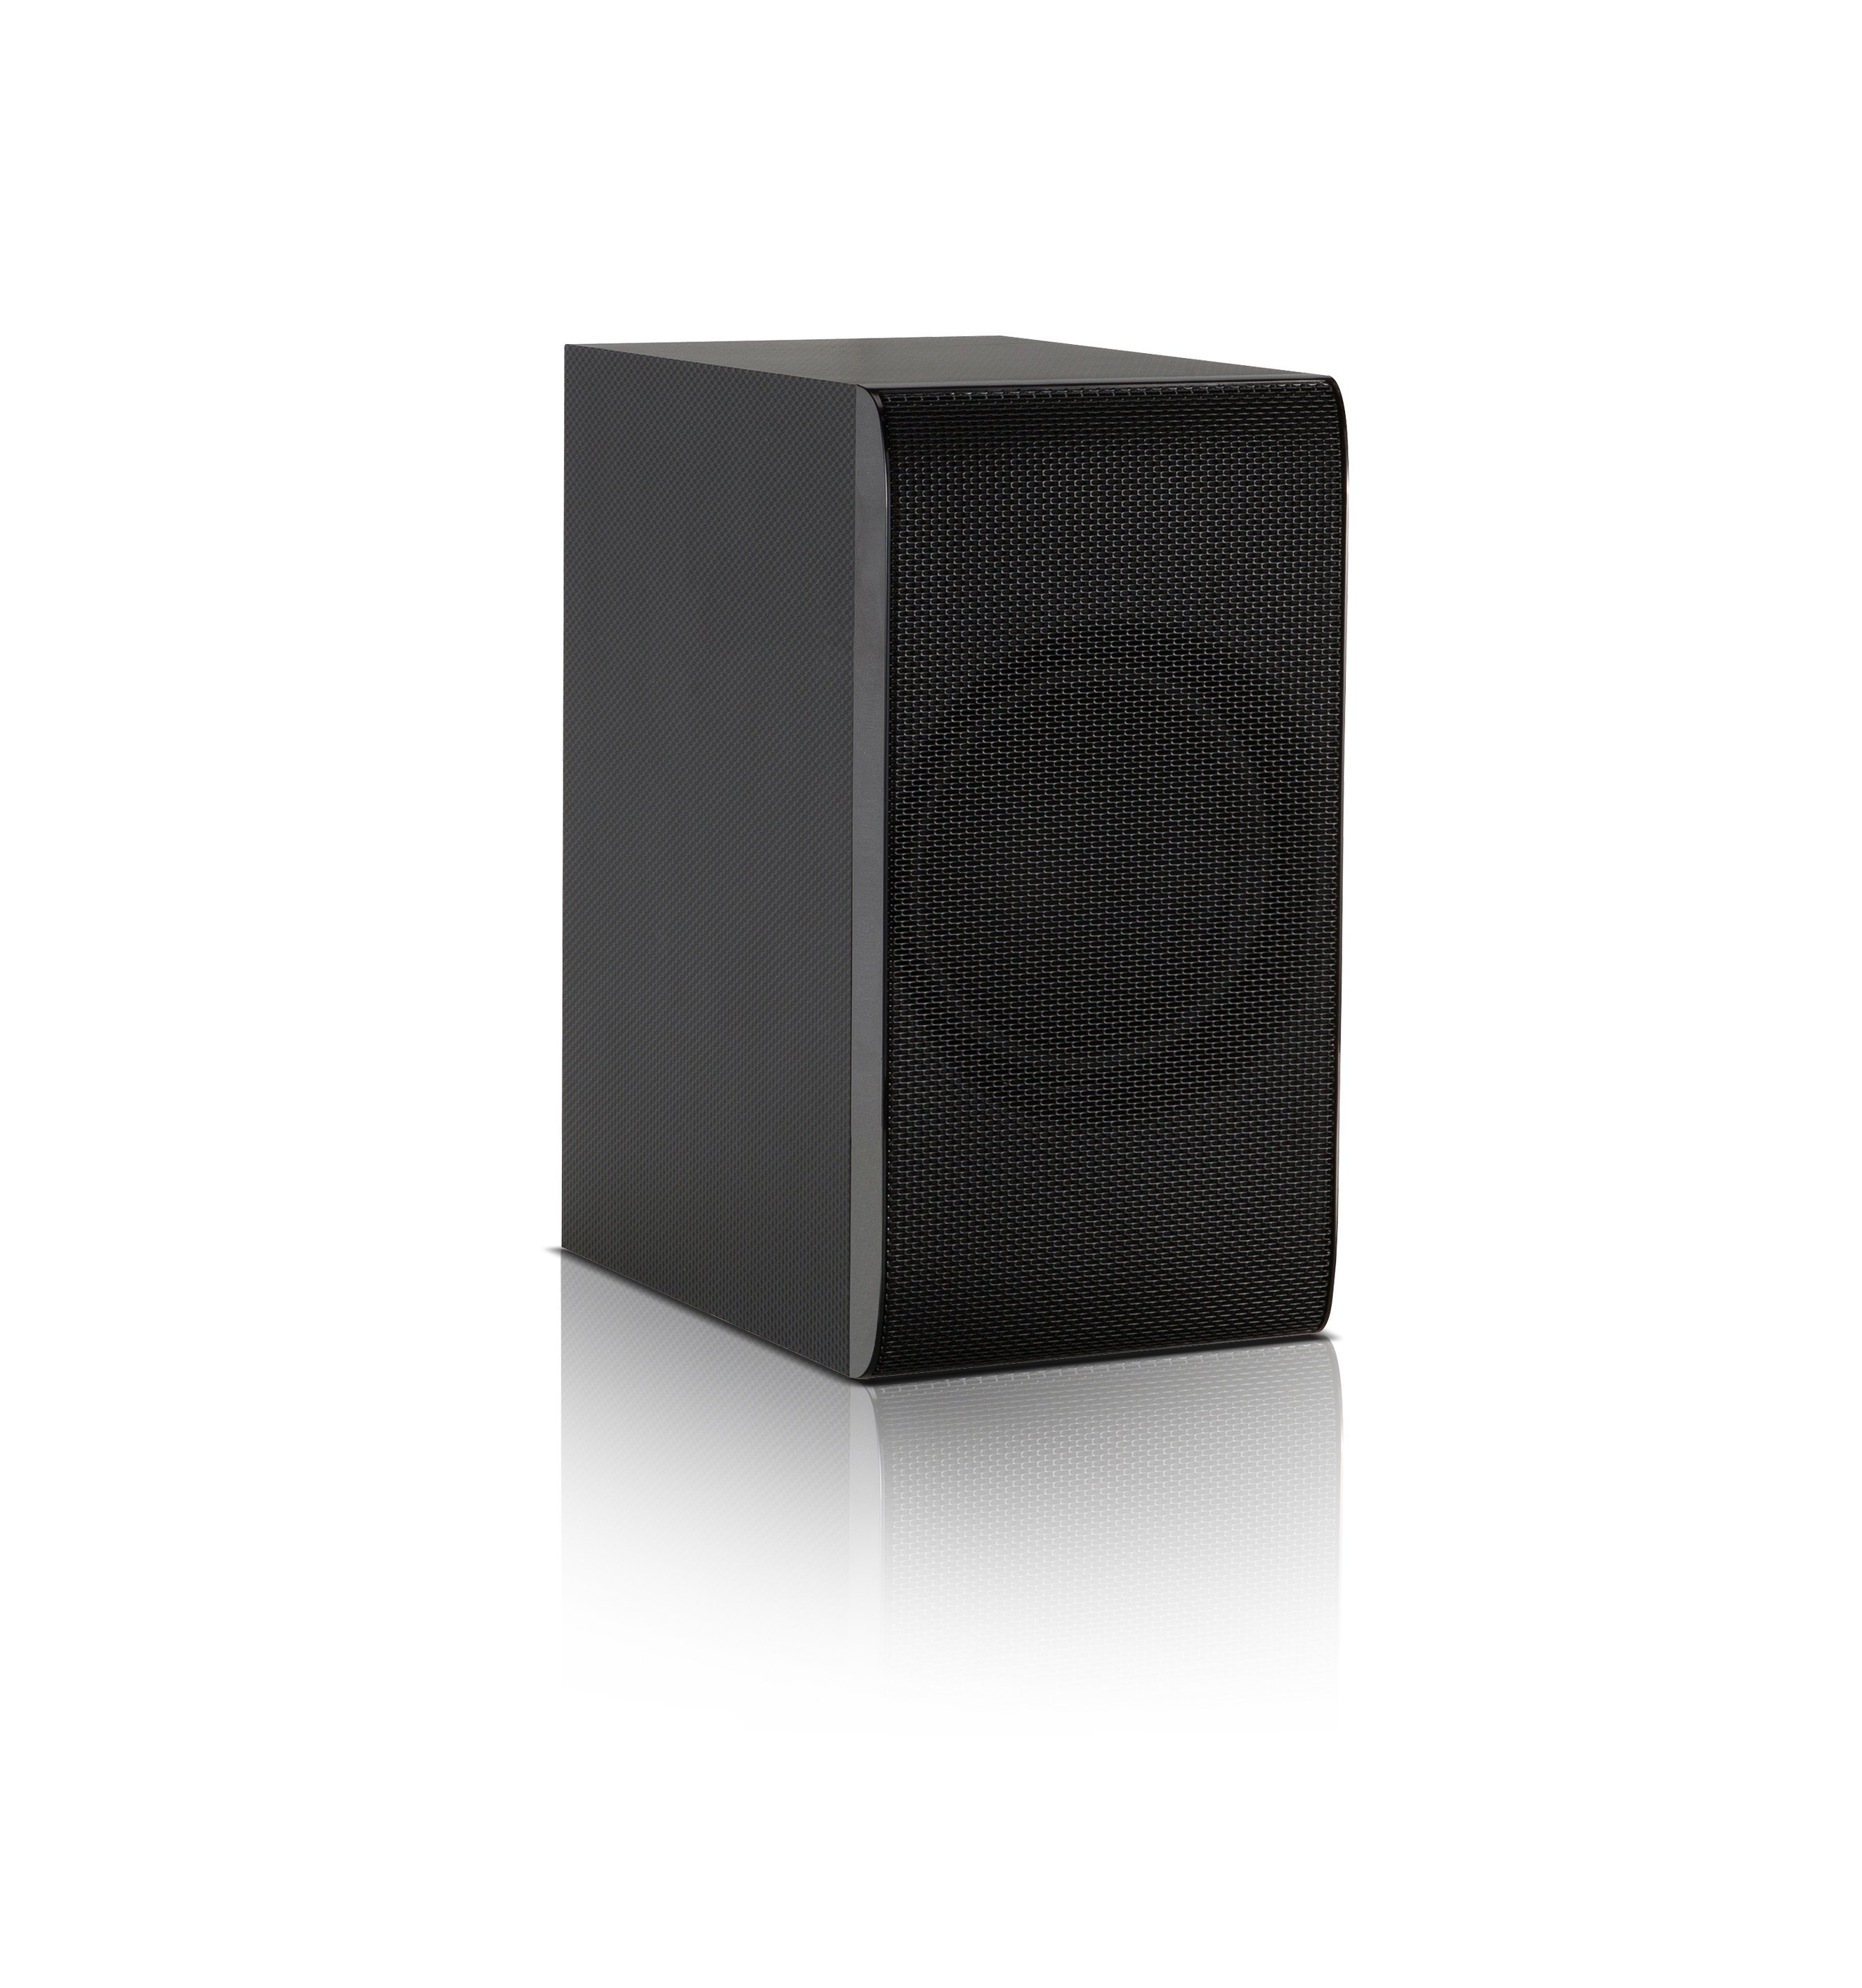 NEW-LG-SJ8-2-1-Channel-Wireless-Ultra-Slim-Soundbar-with-Bluetooth